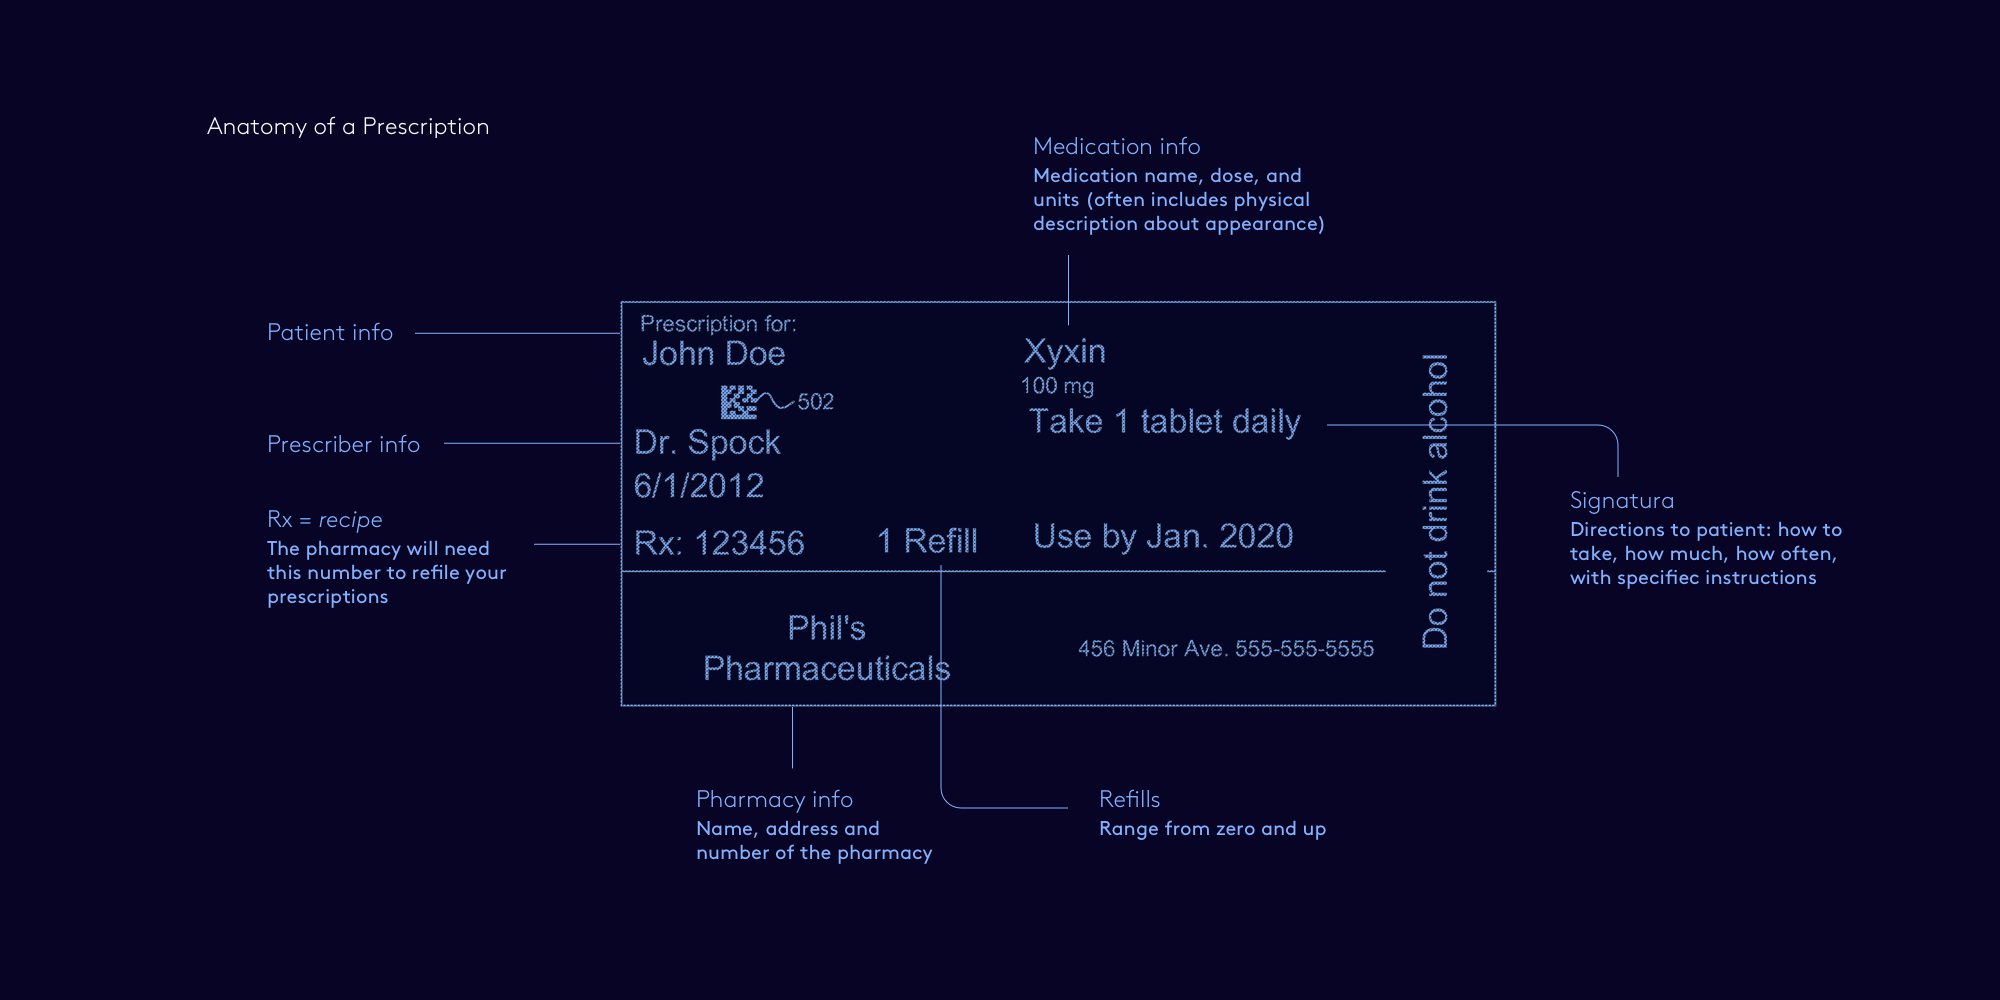 myrx-prescription-2